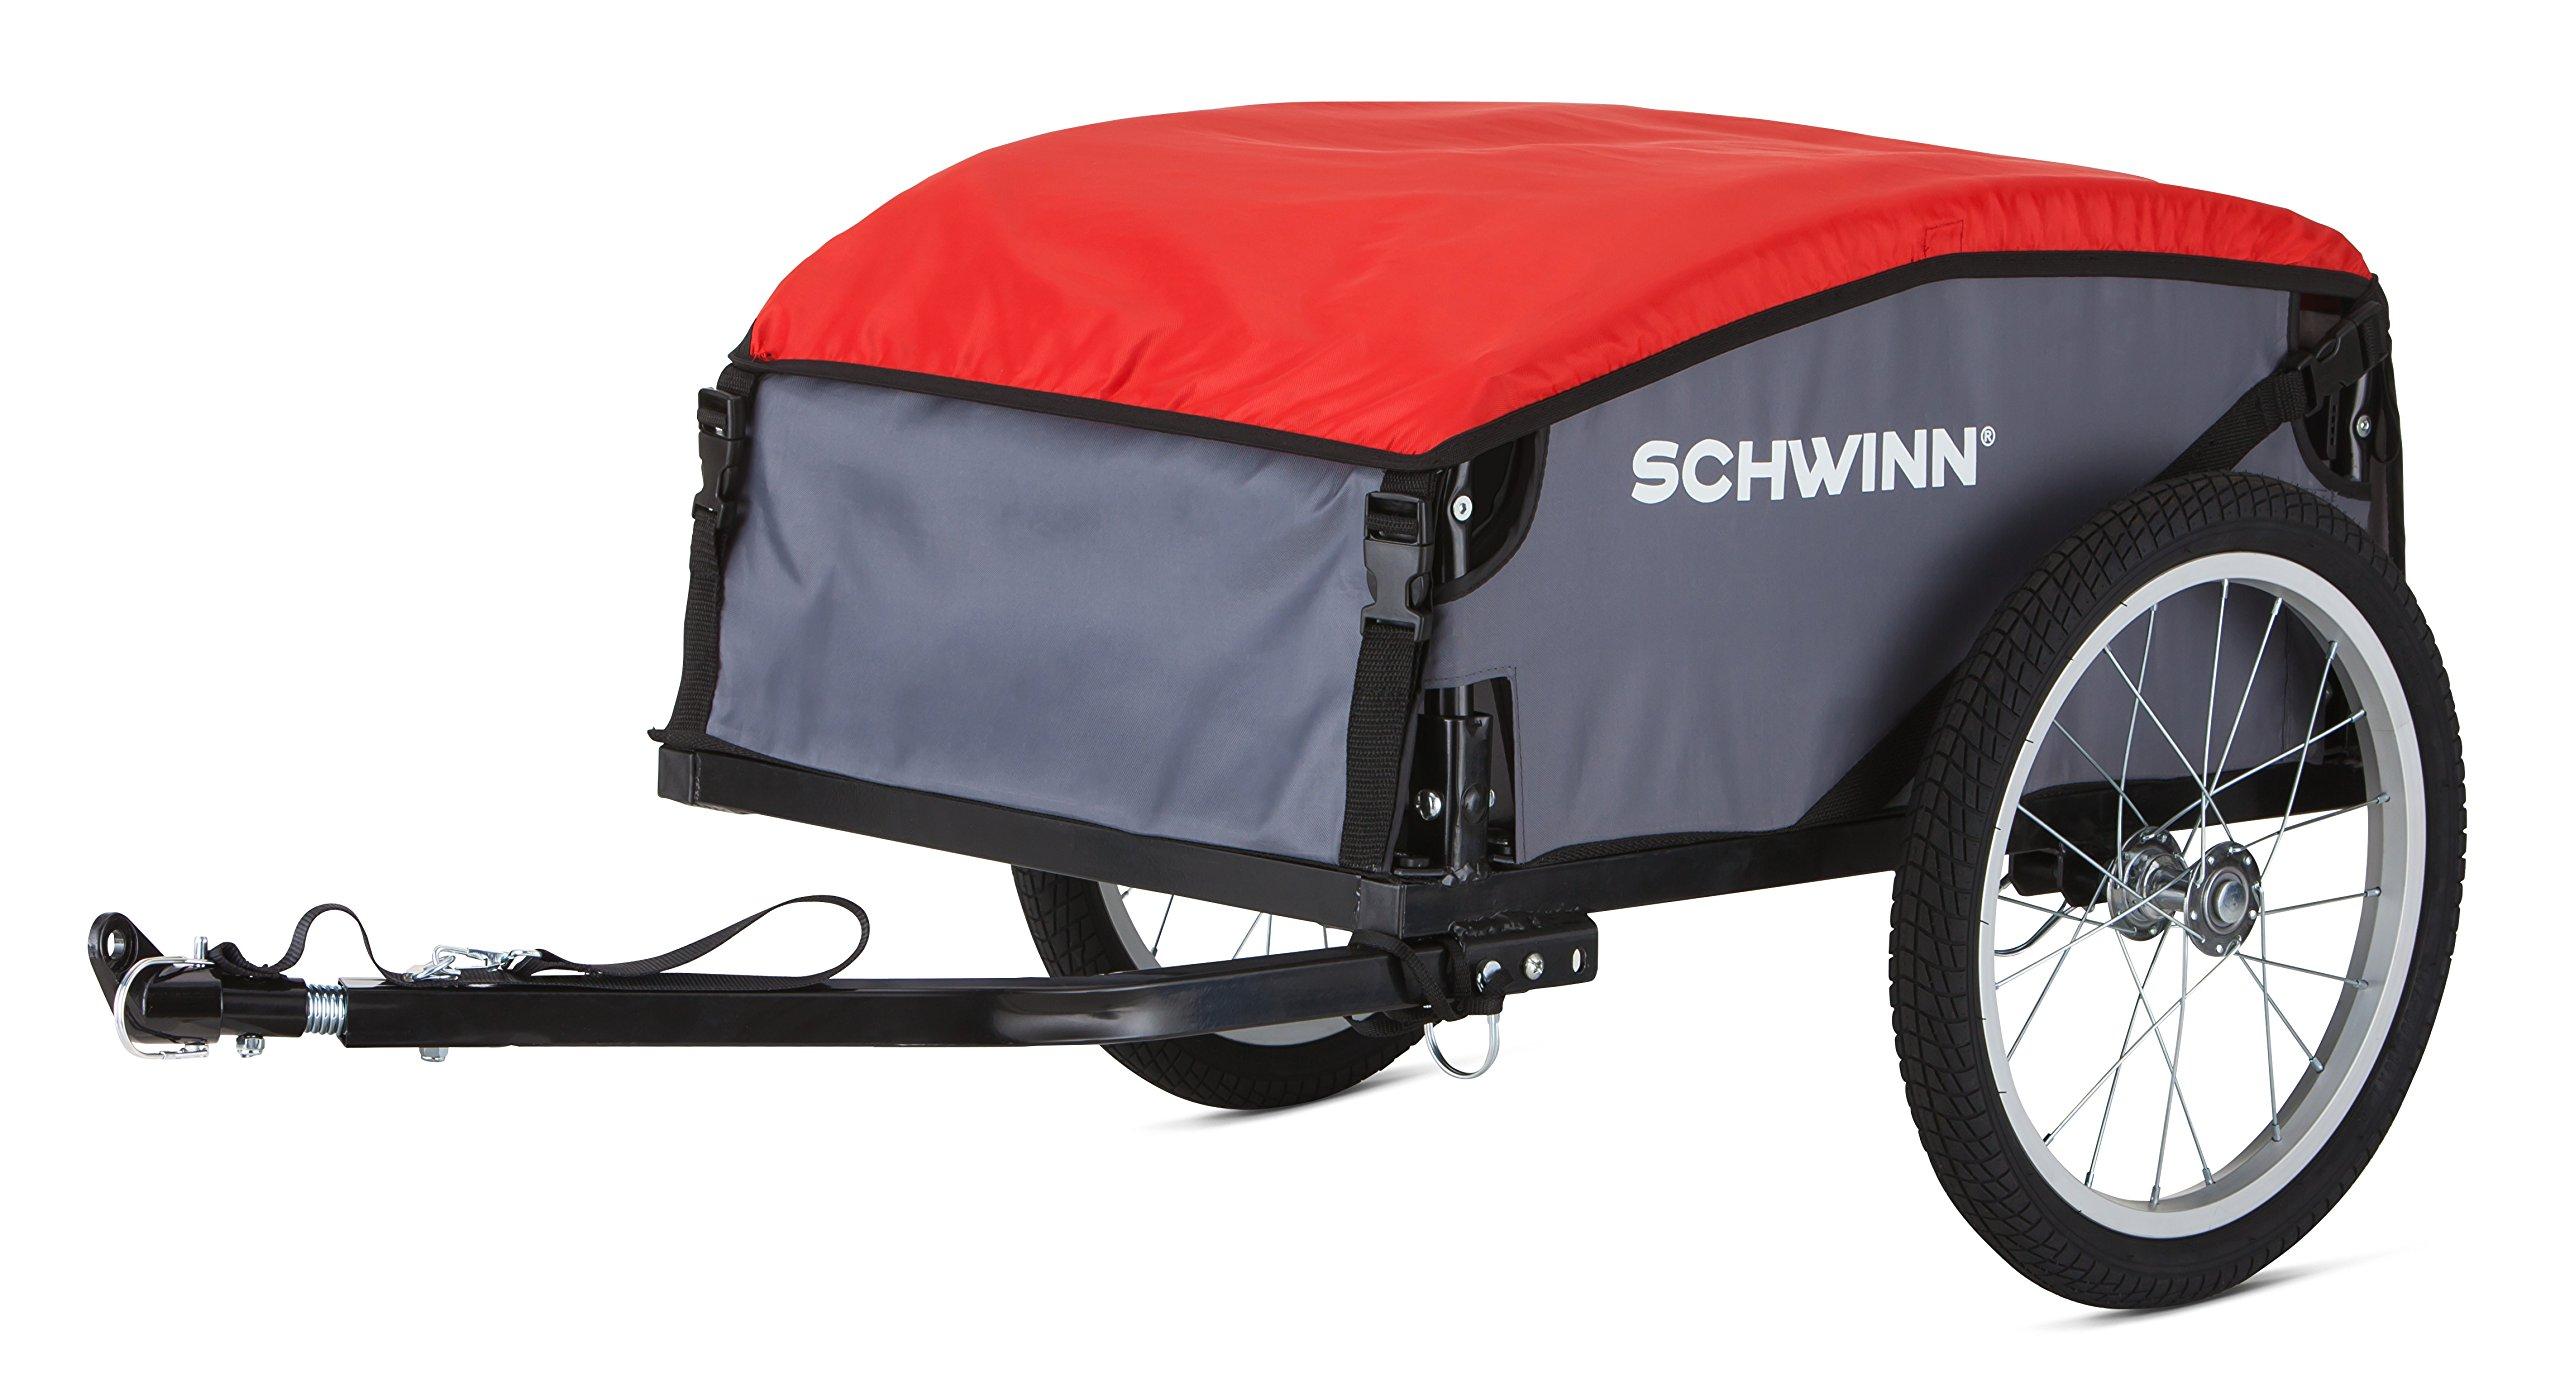 Schwinn Day Tripper Cargo Trailer, Red/Grey